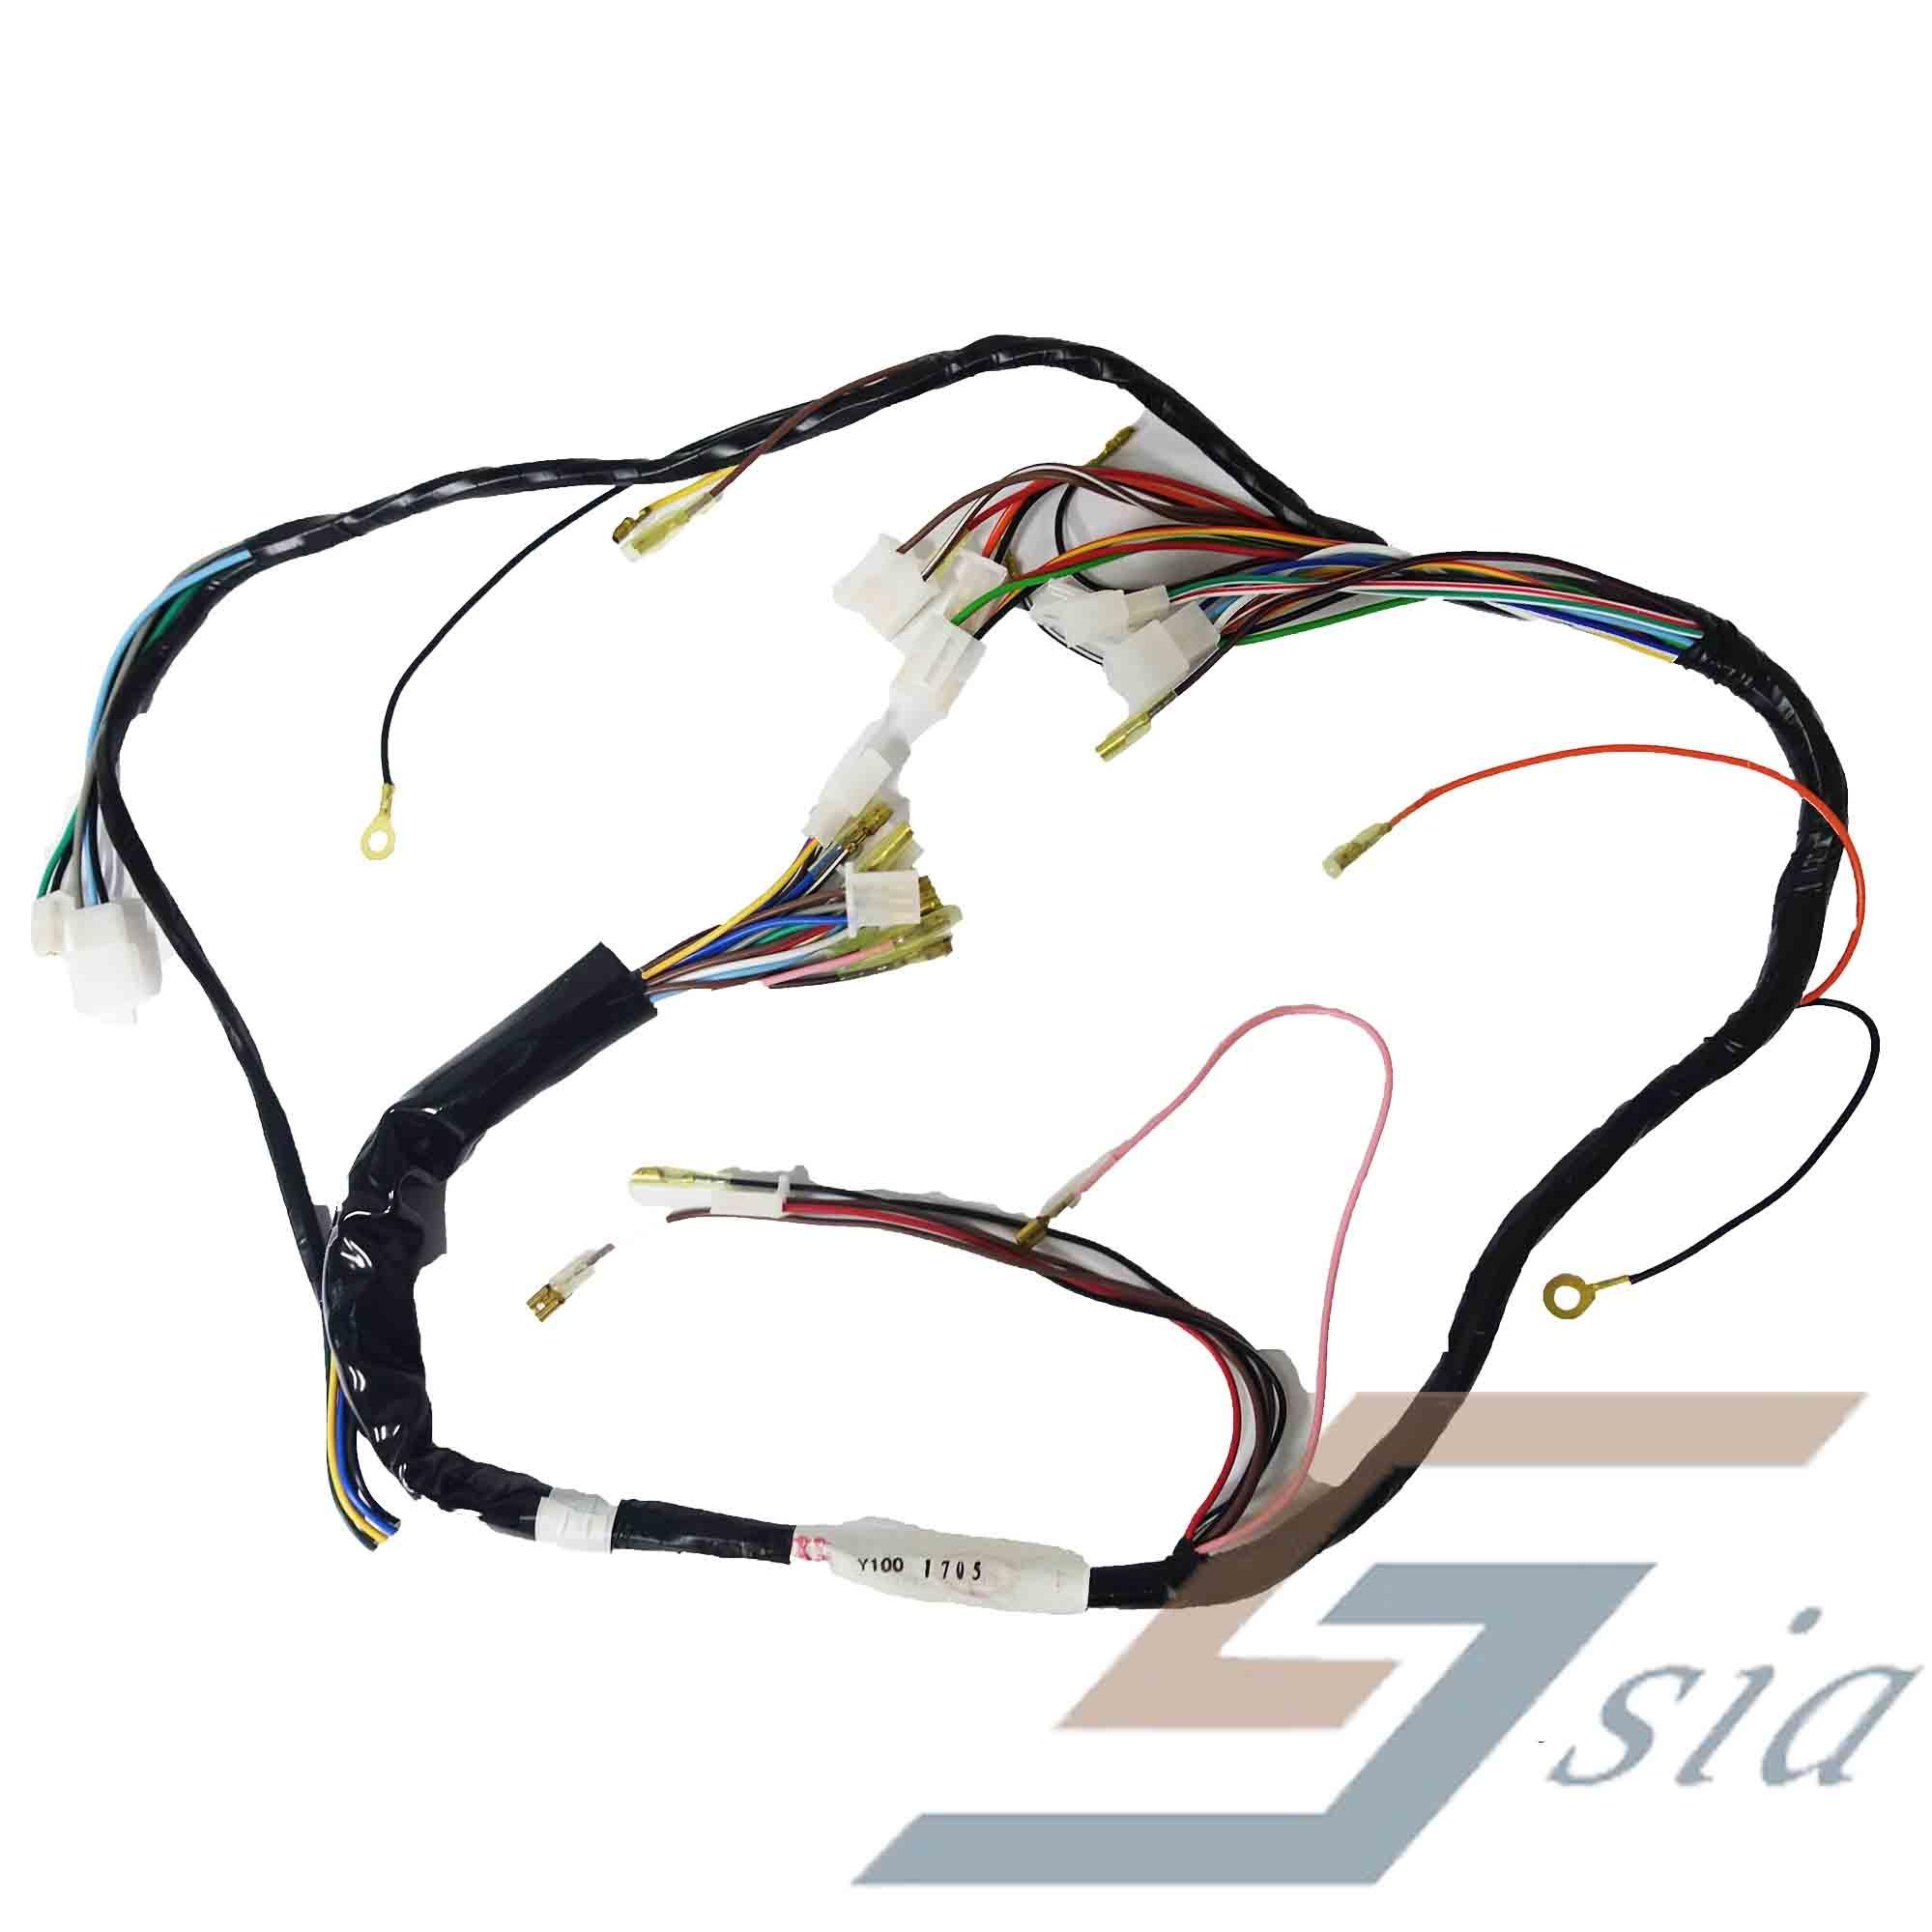 yamaha y100 wiring complete set  ‹ ›